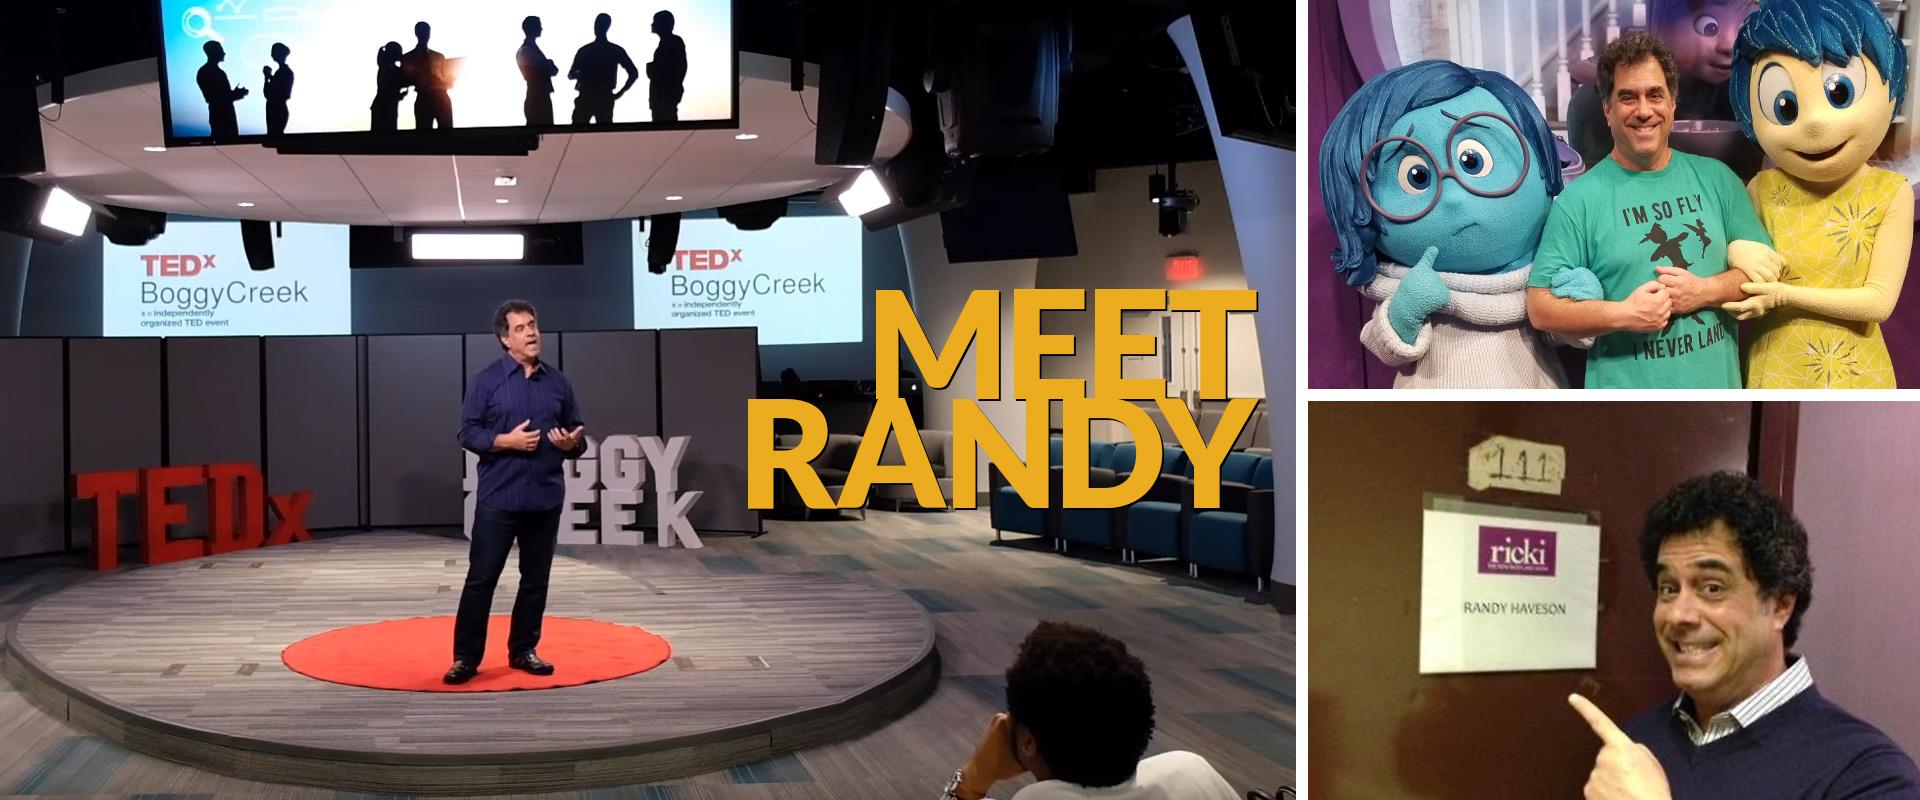 Meet Randy Haveson